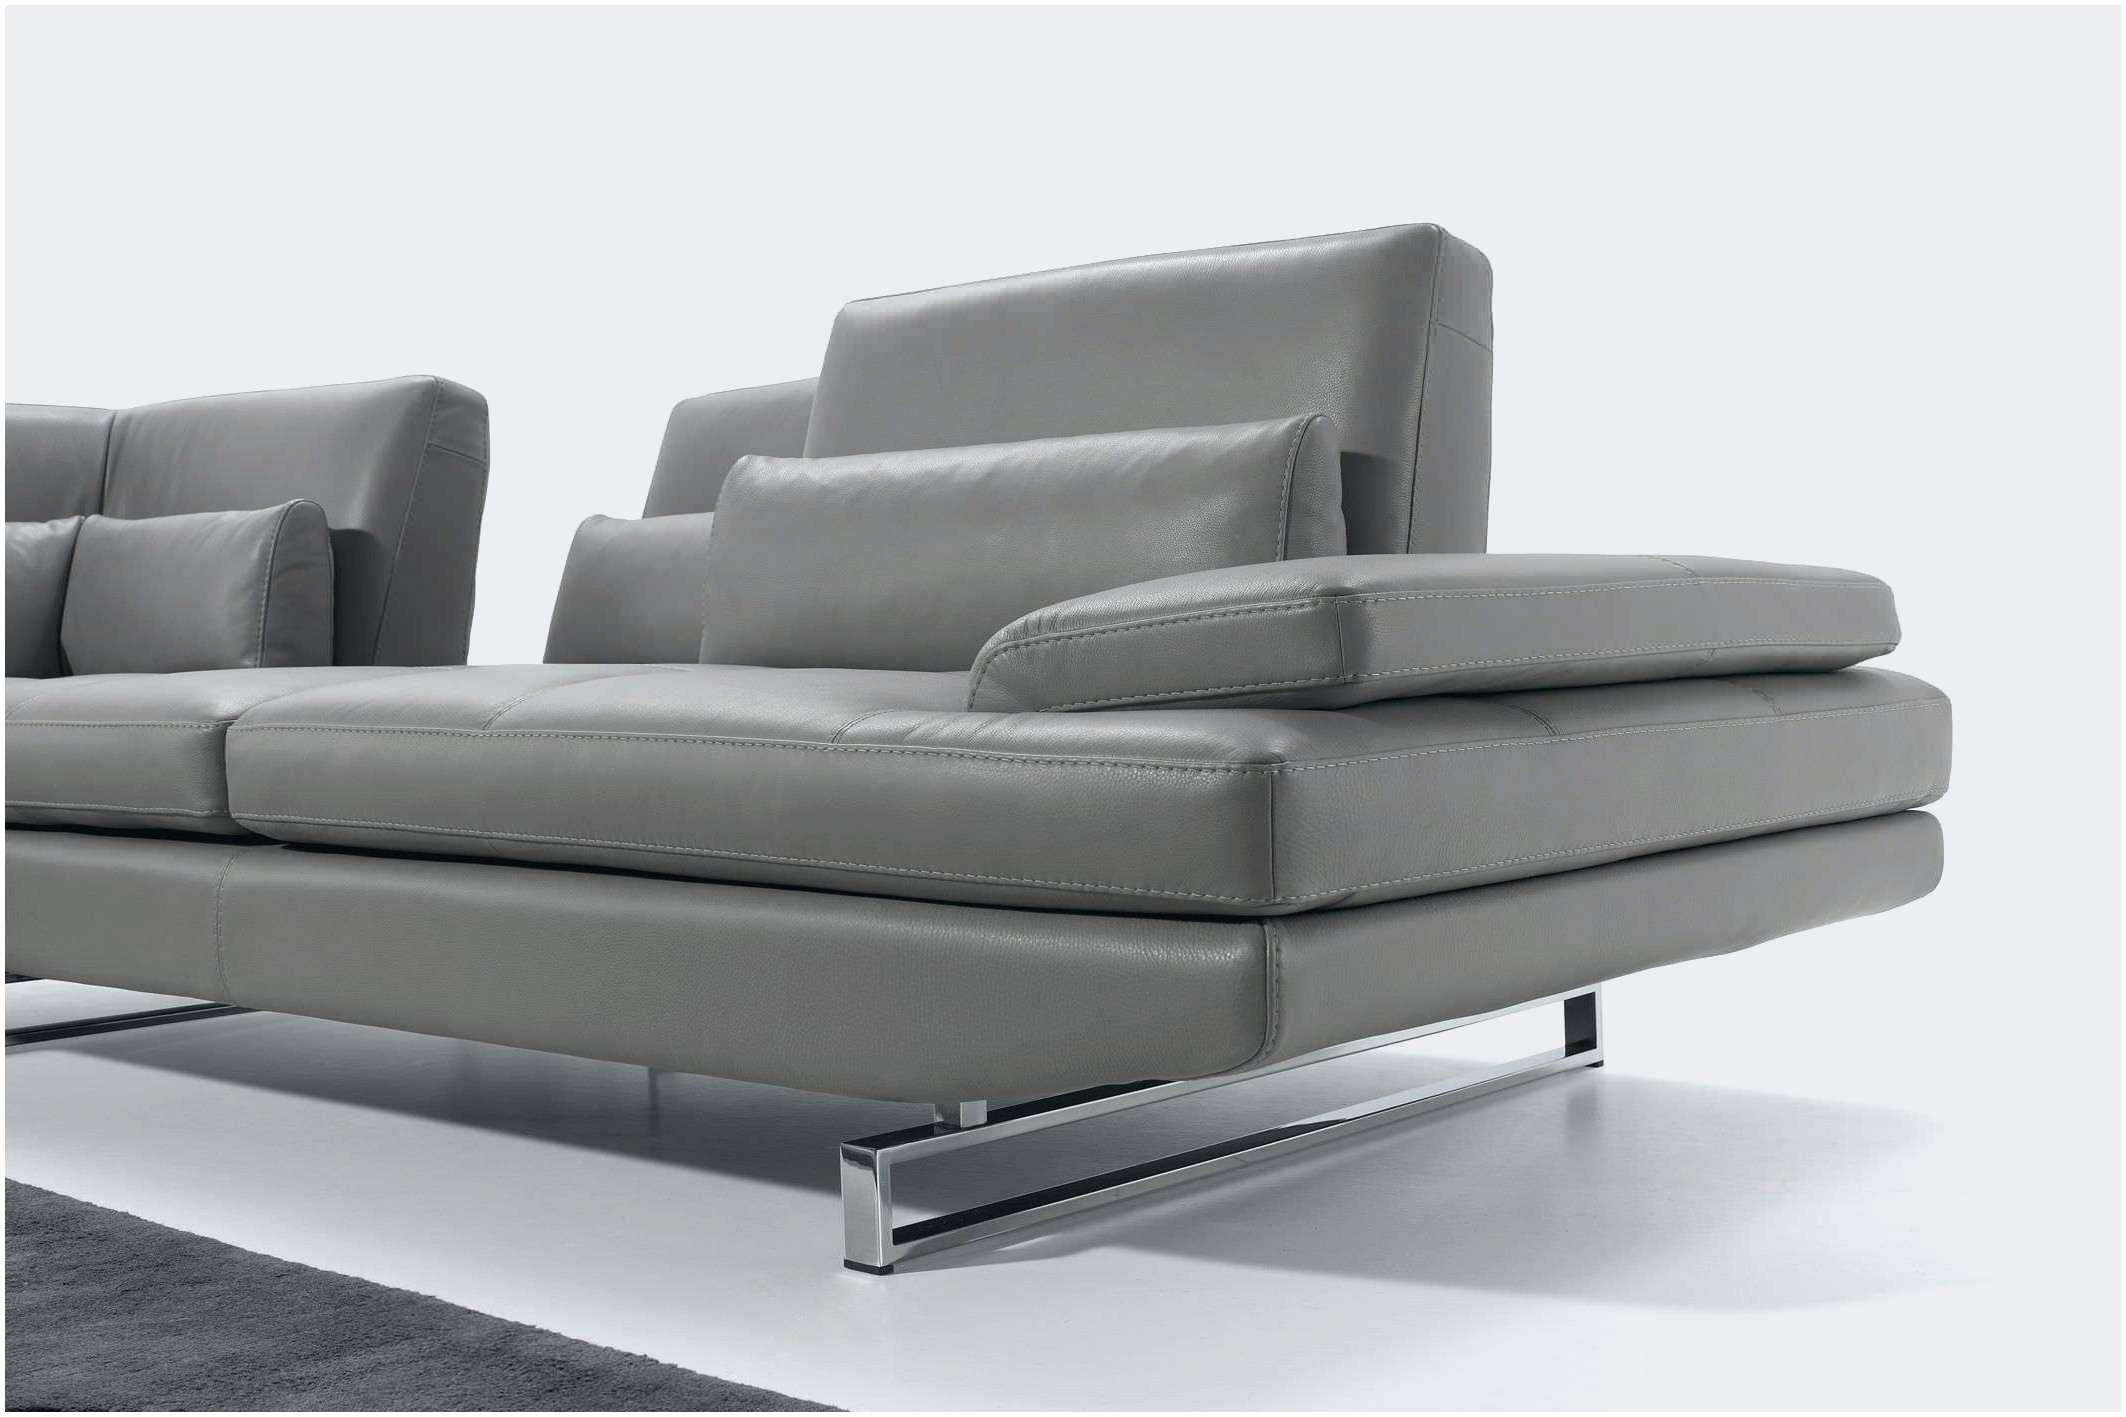 Jongor4hire Page 101 of 2056 Home & Interior Design